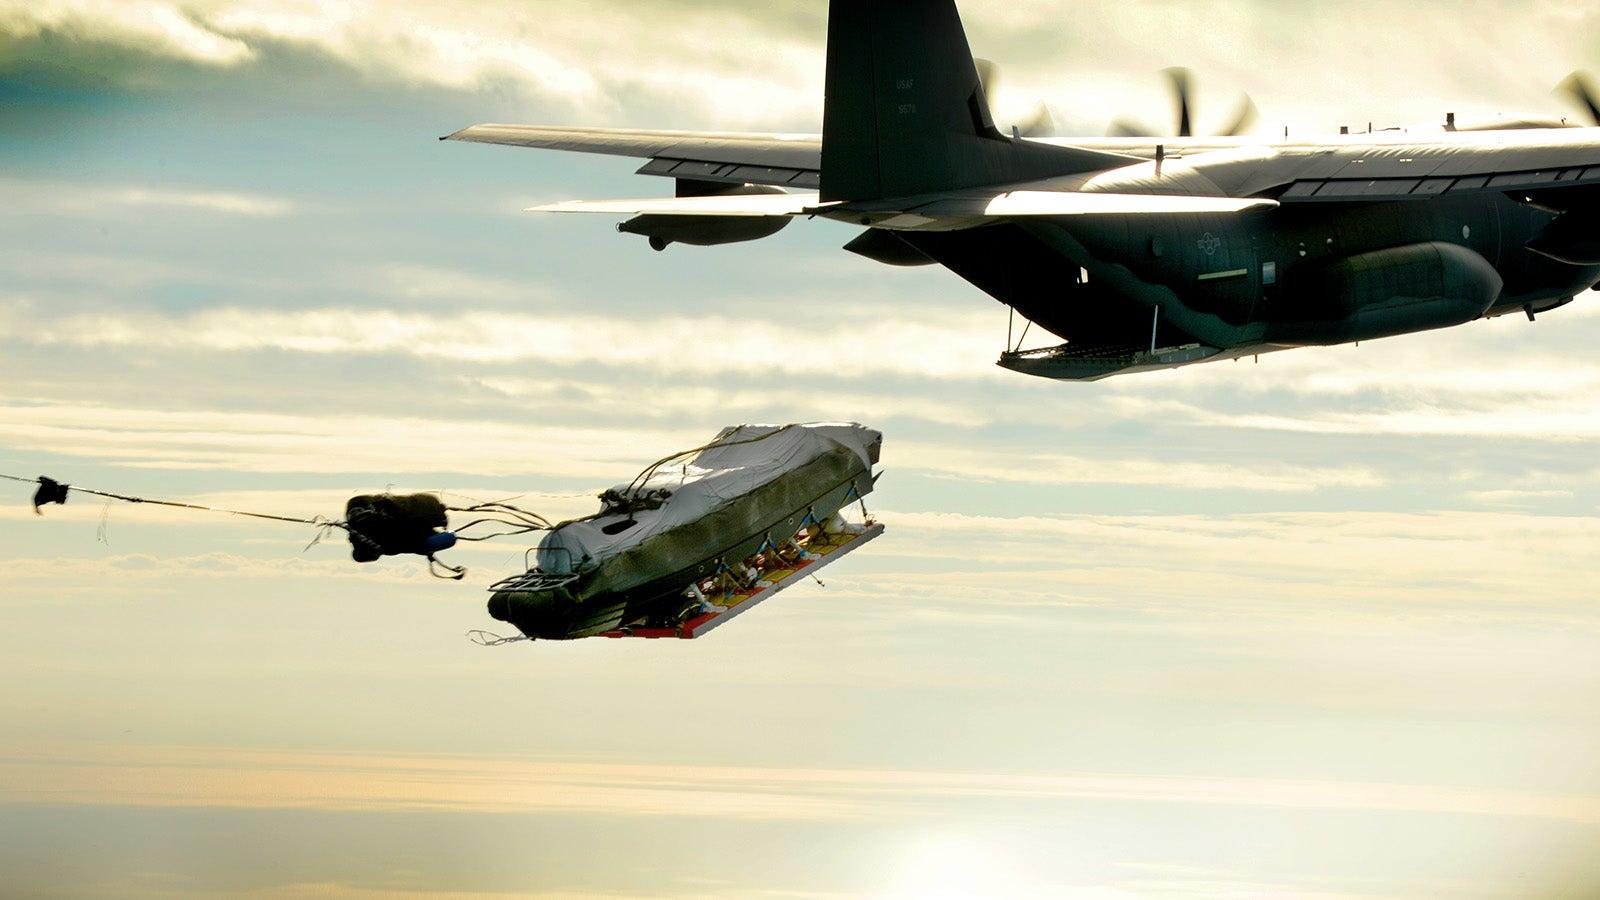 airdrop commando-boat image-cache usaf